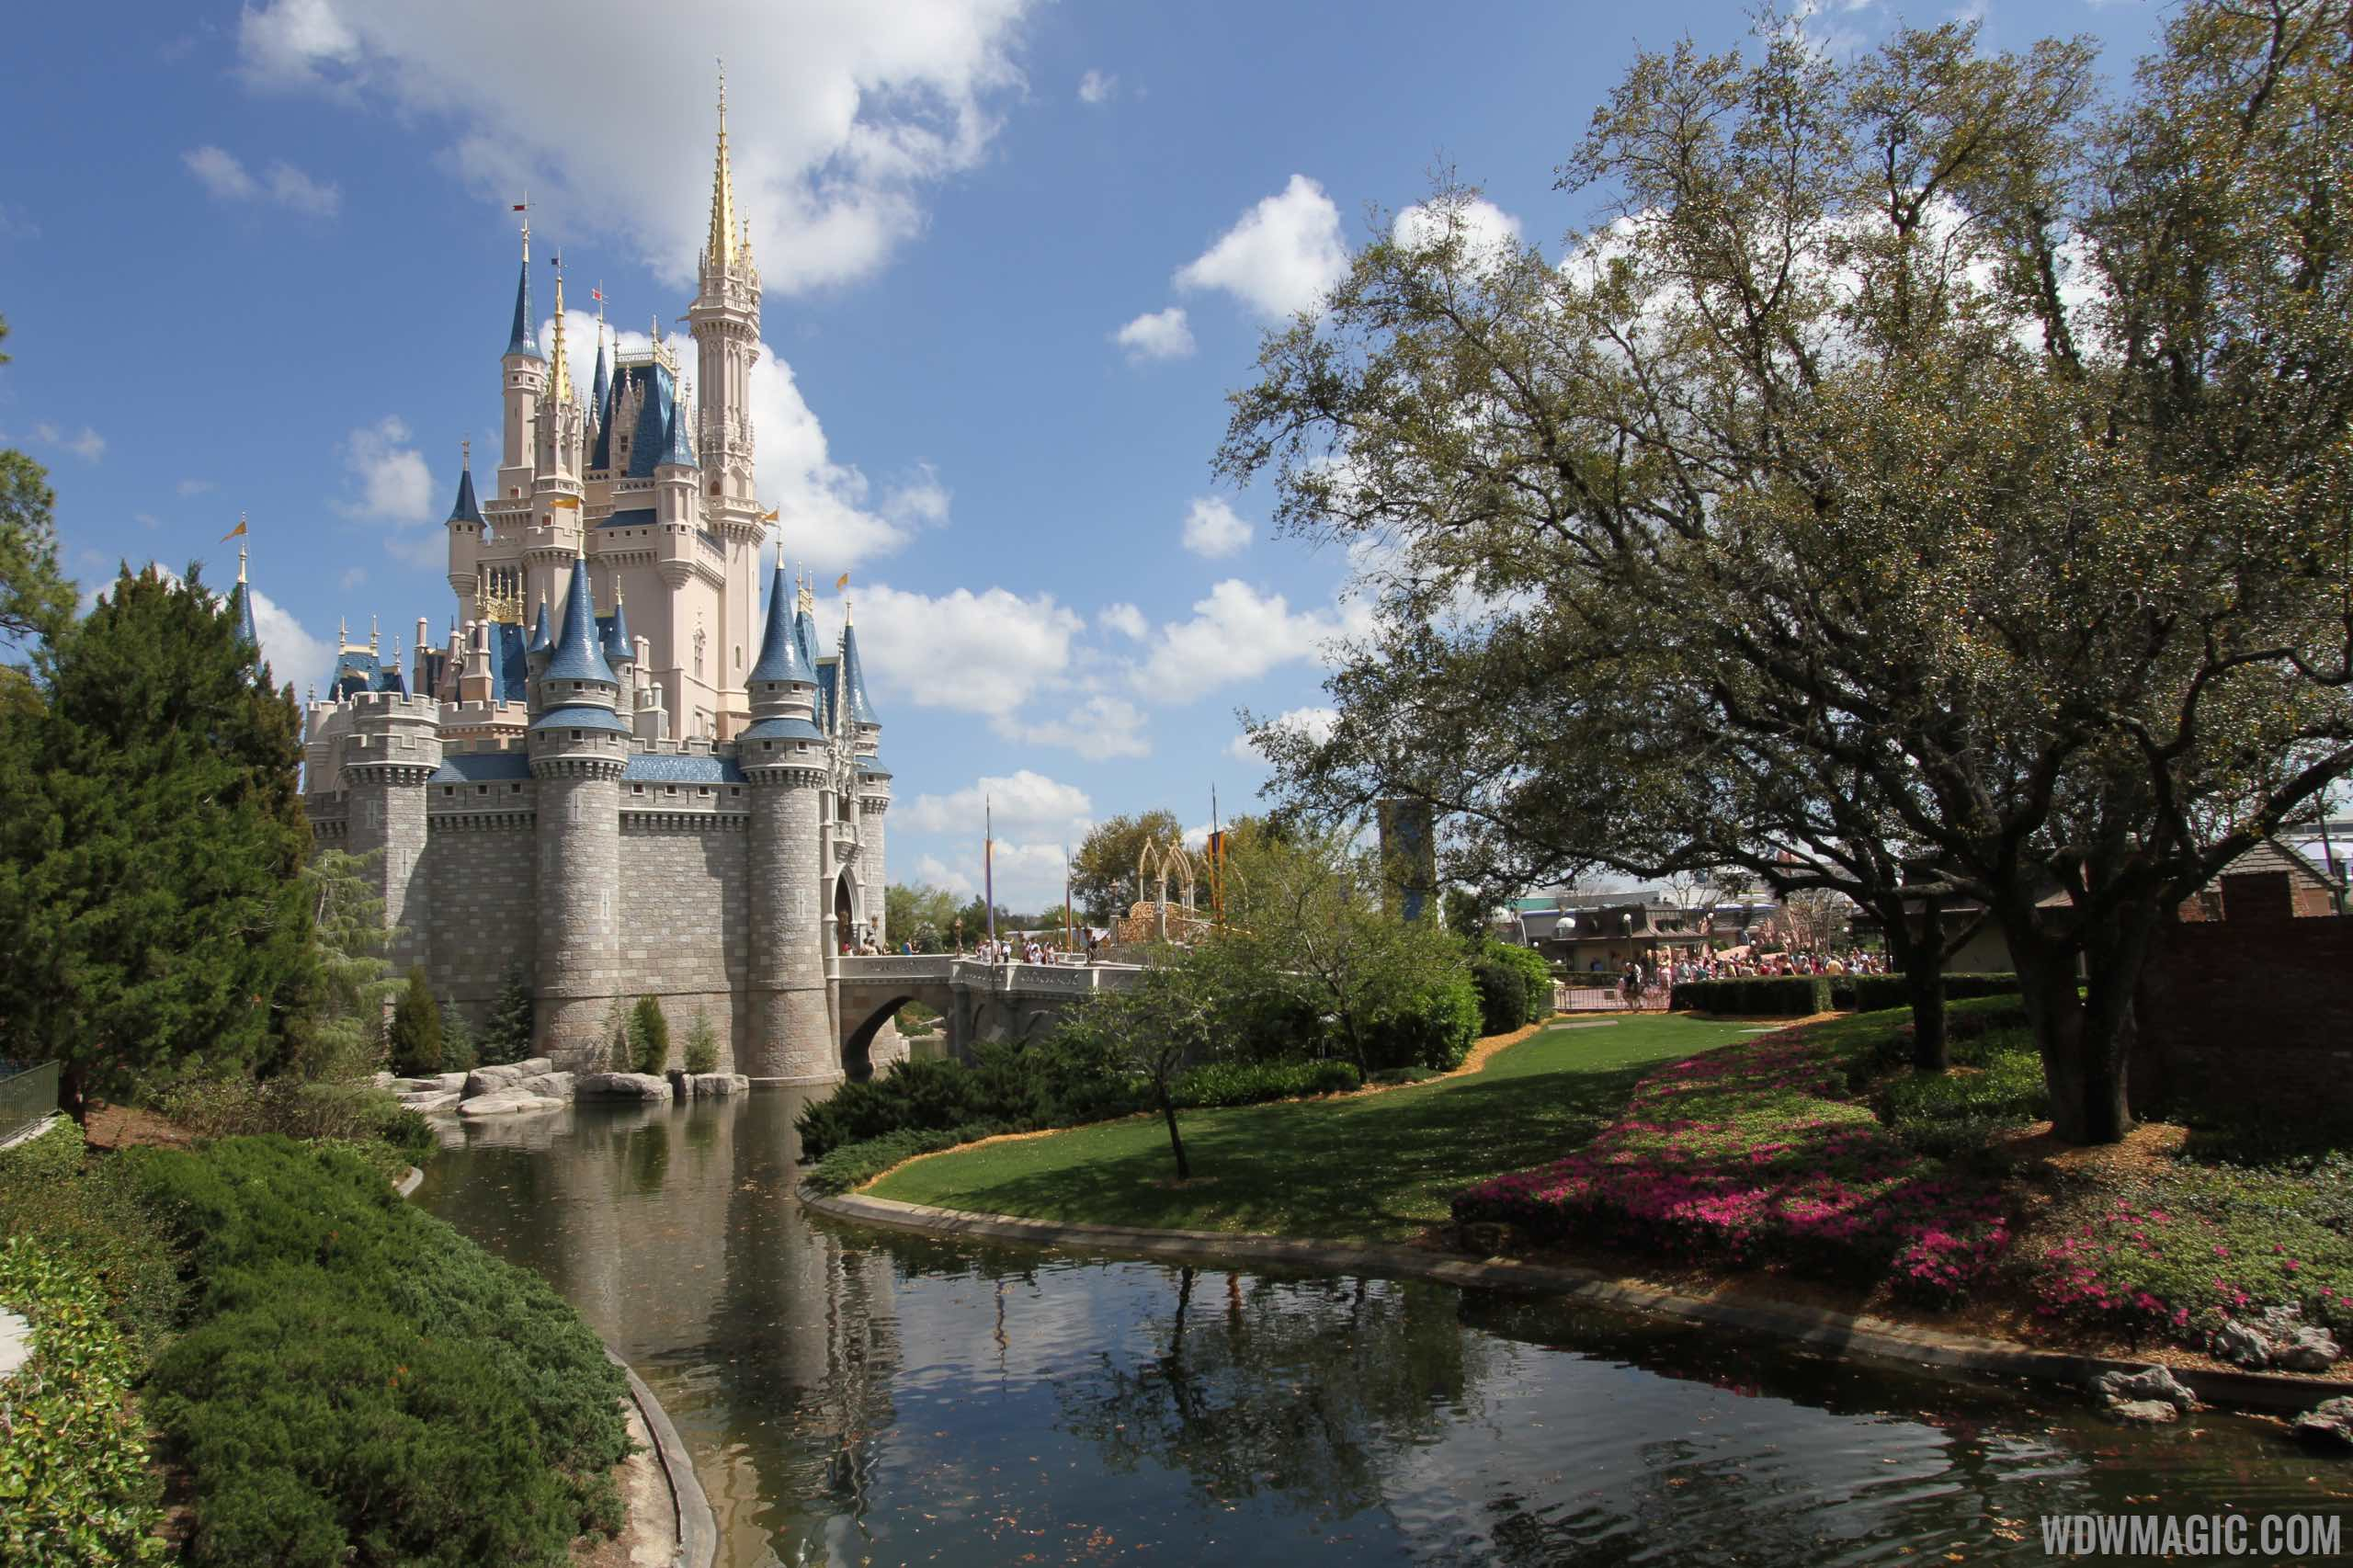 Magic Kingdom overview